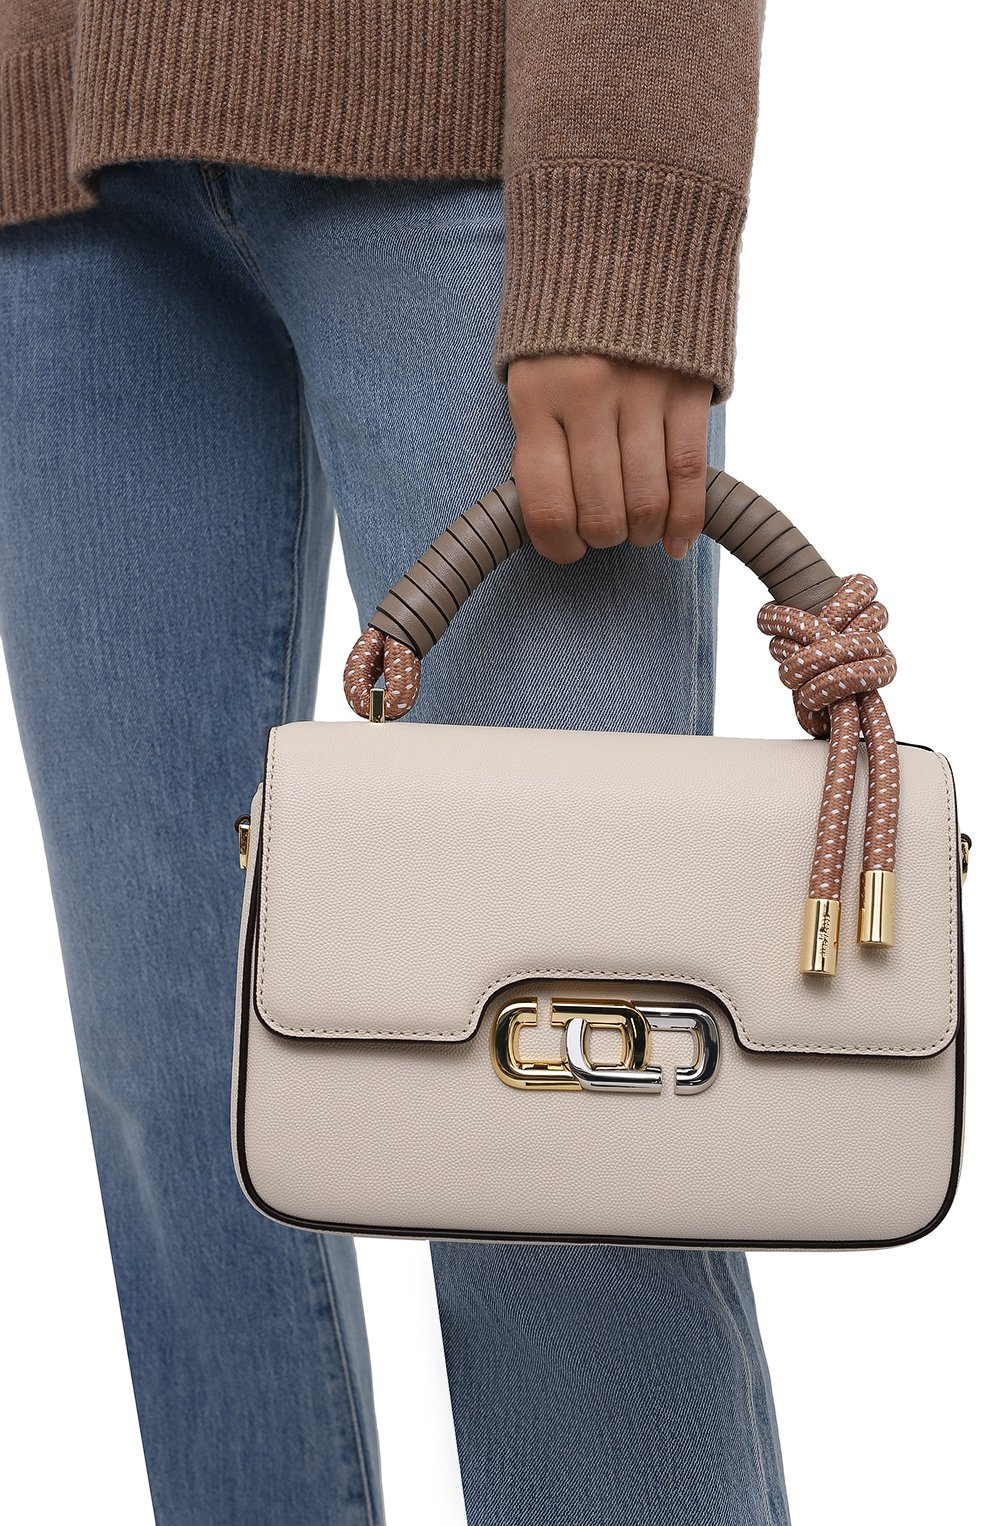 Женская сумка the j link MARC JACOBS (THE) кремвого цвета, арт. M0017067 | Фото 2